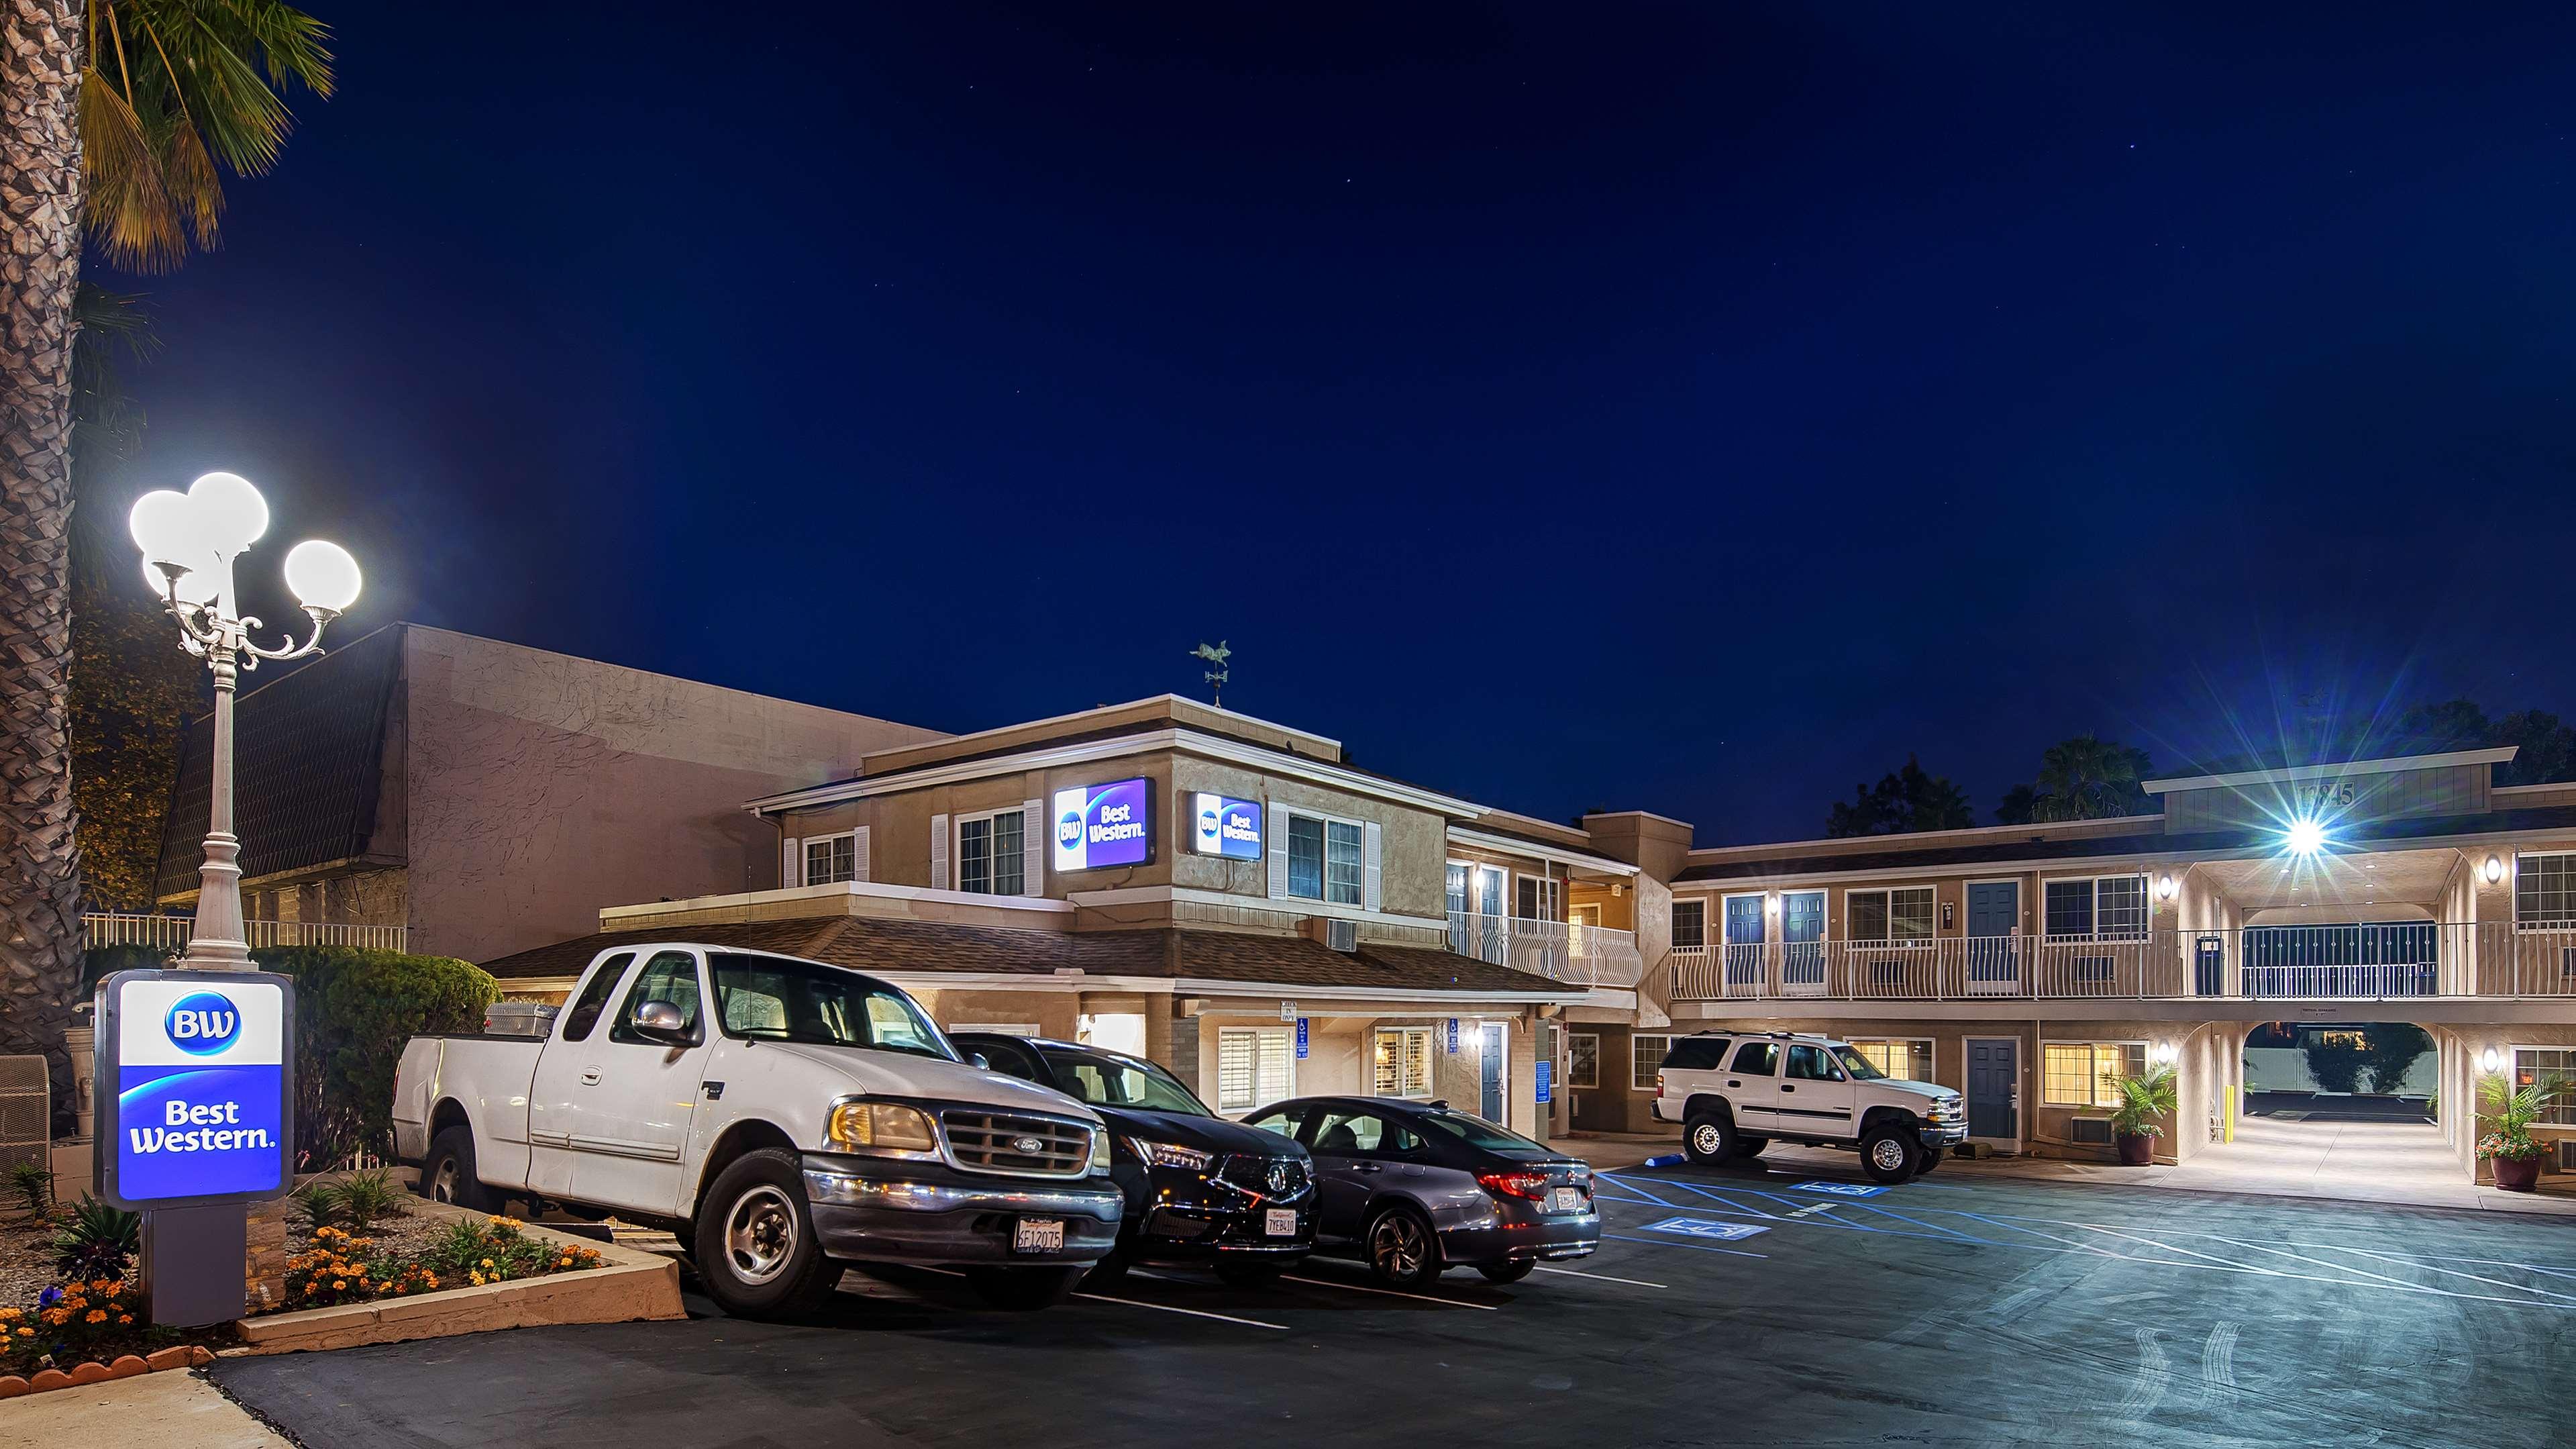 Best Western Poway/San Diego Hotel image 0